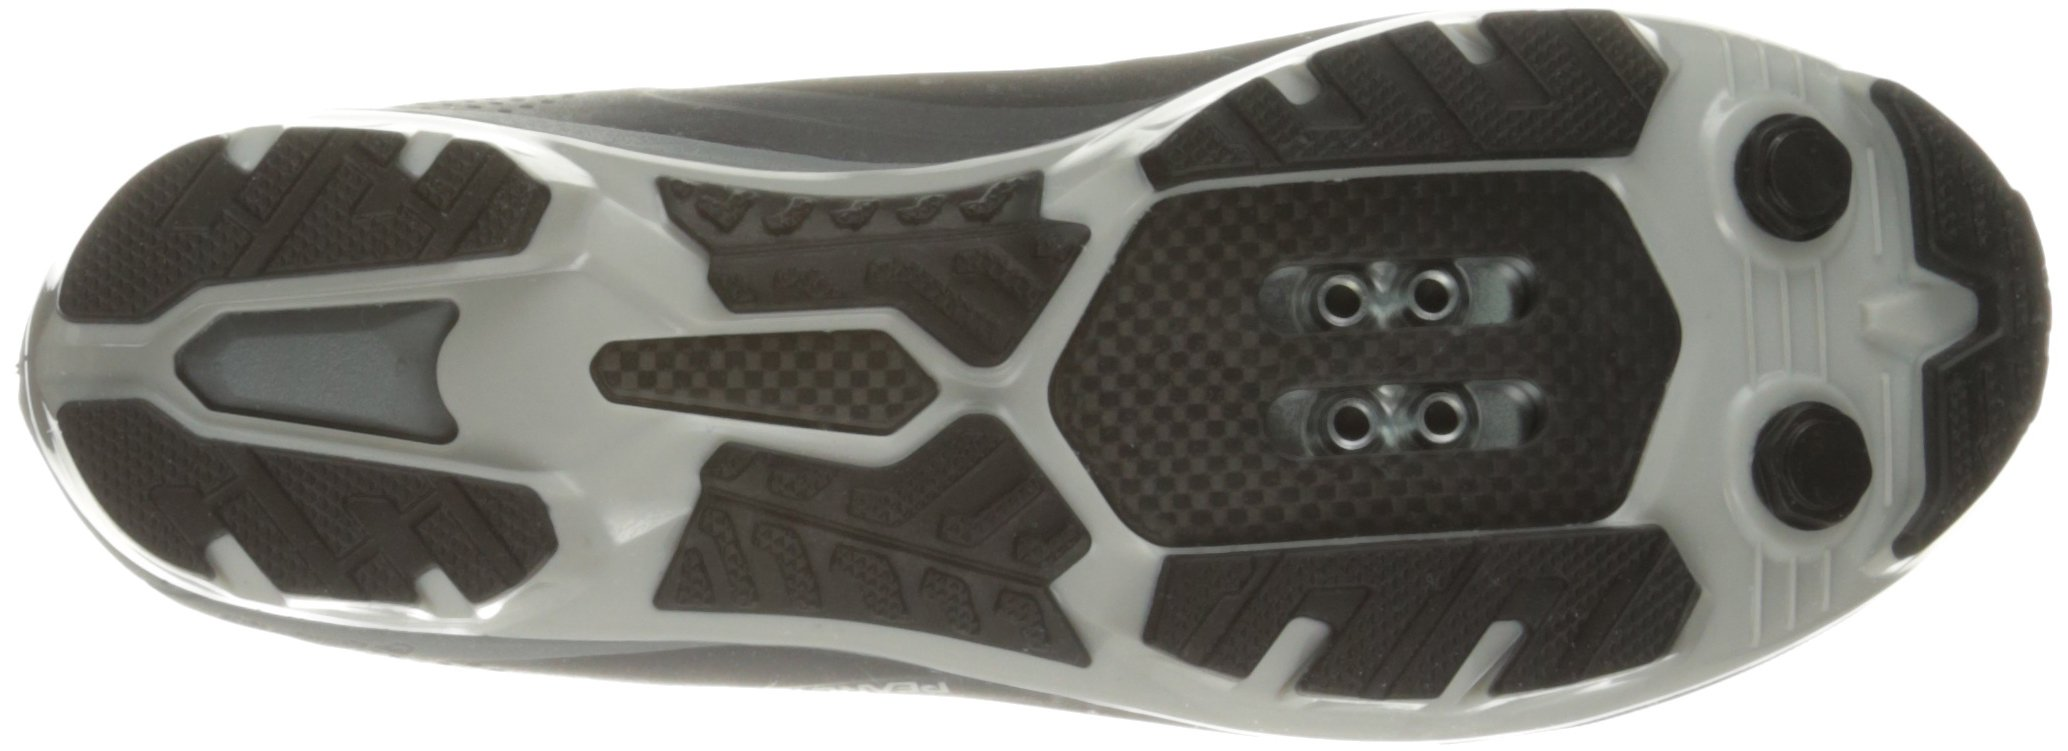 Pearl Izumi Women's w x-Project Elite Cycling Shoe, Black/Monument Grey, 40 EU/8.4 B US by Pearl iZUMi (Image #3)